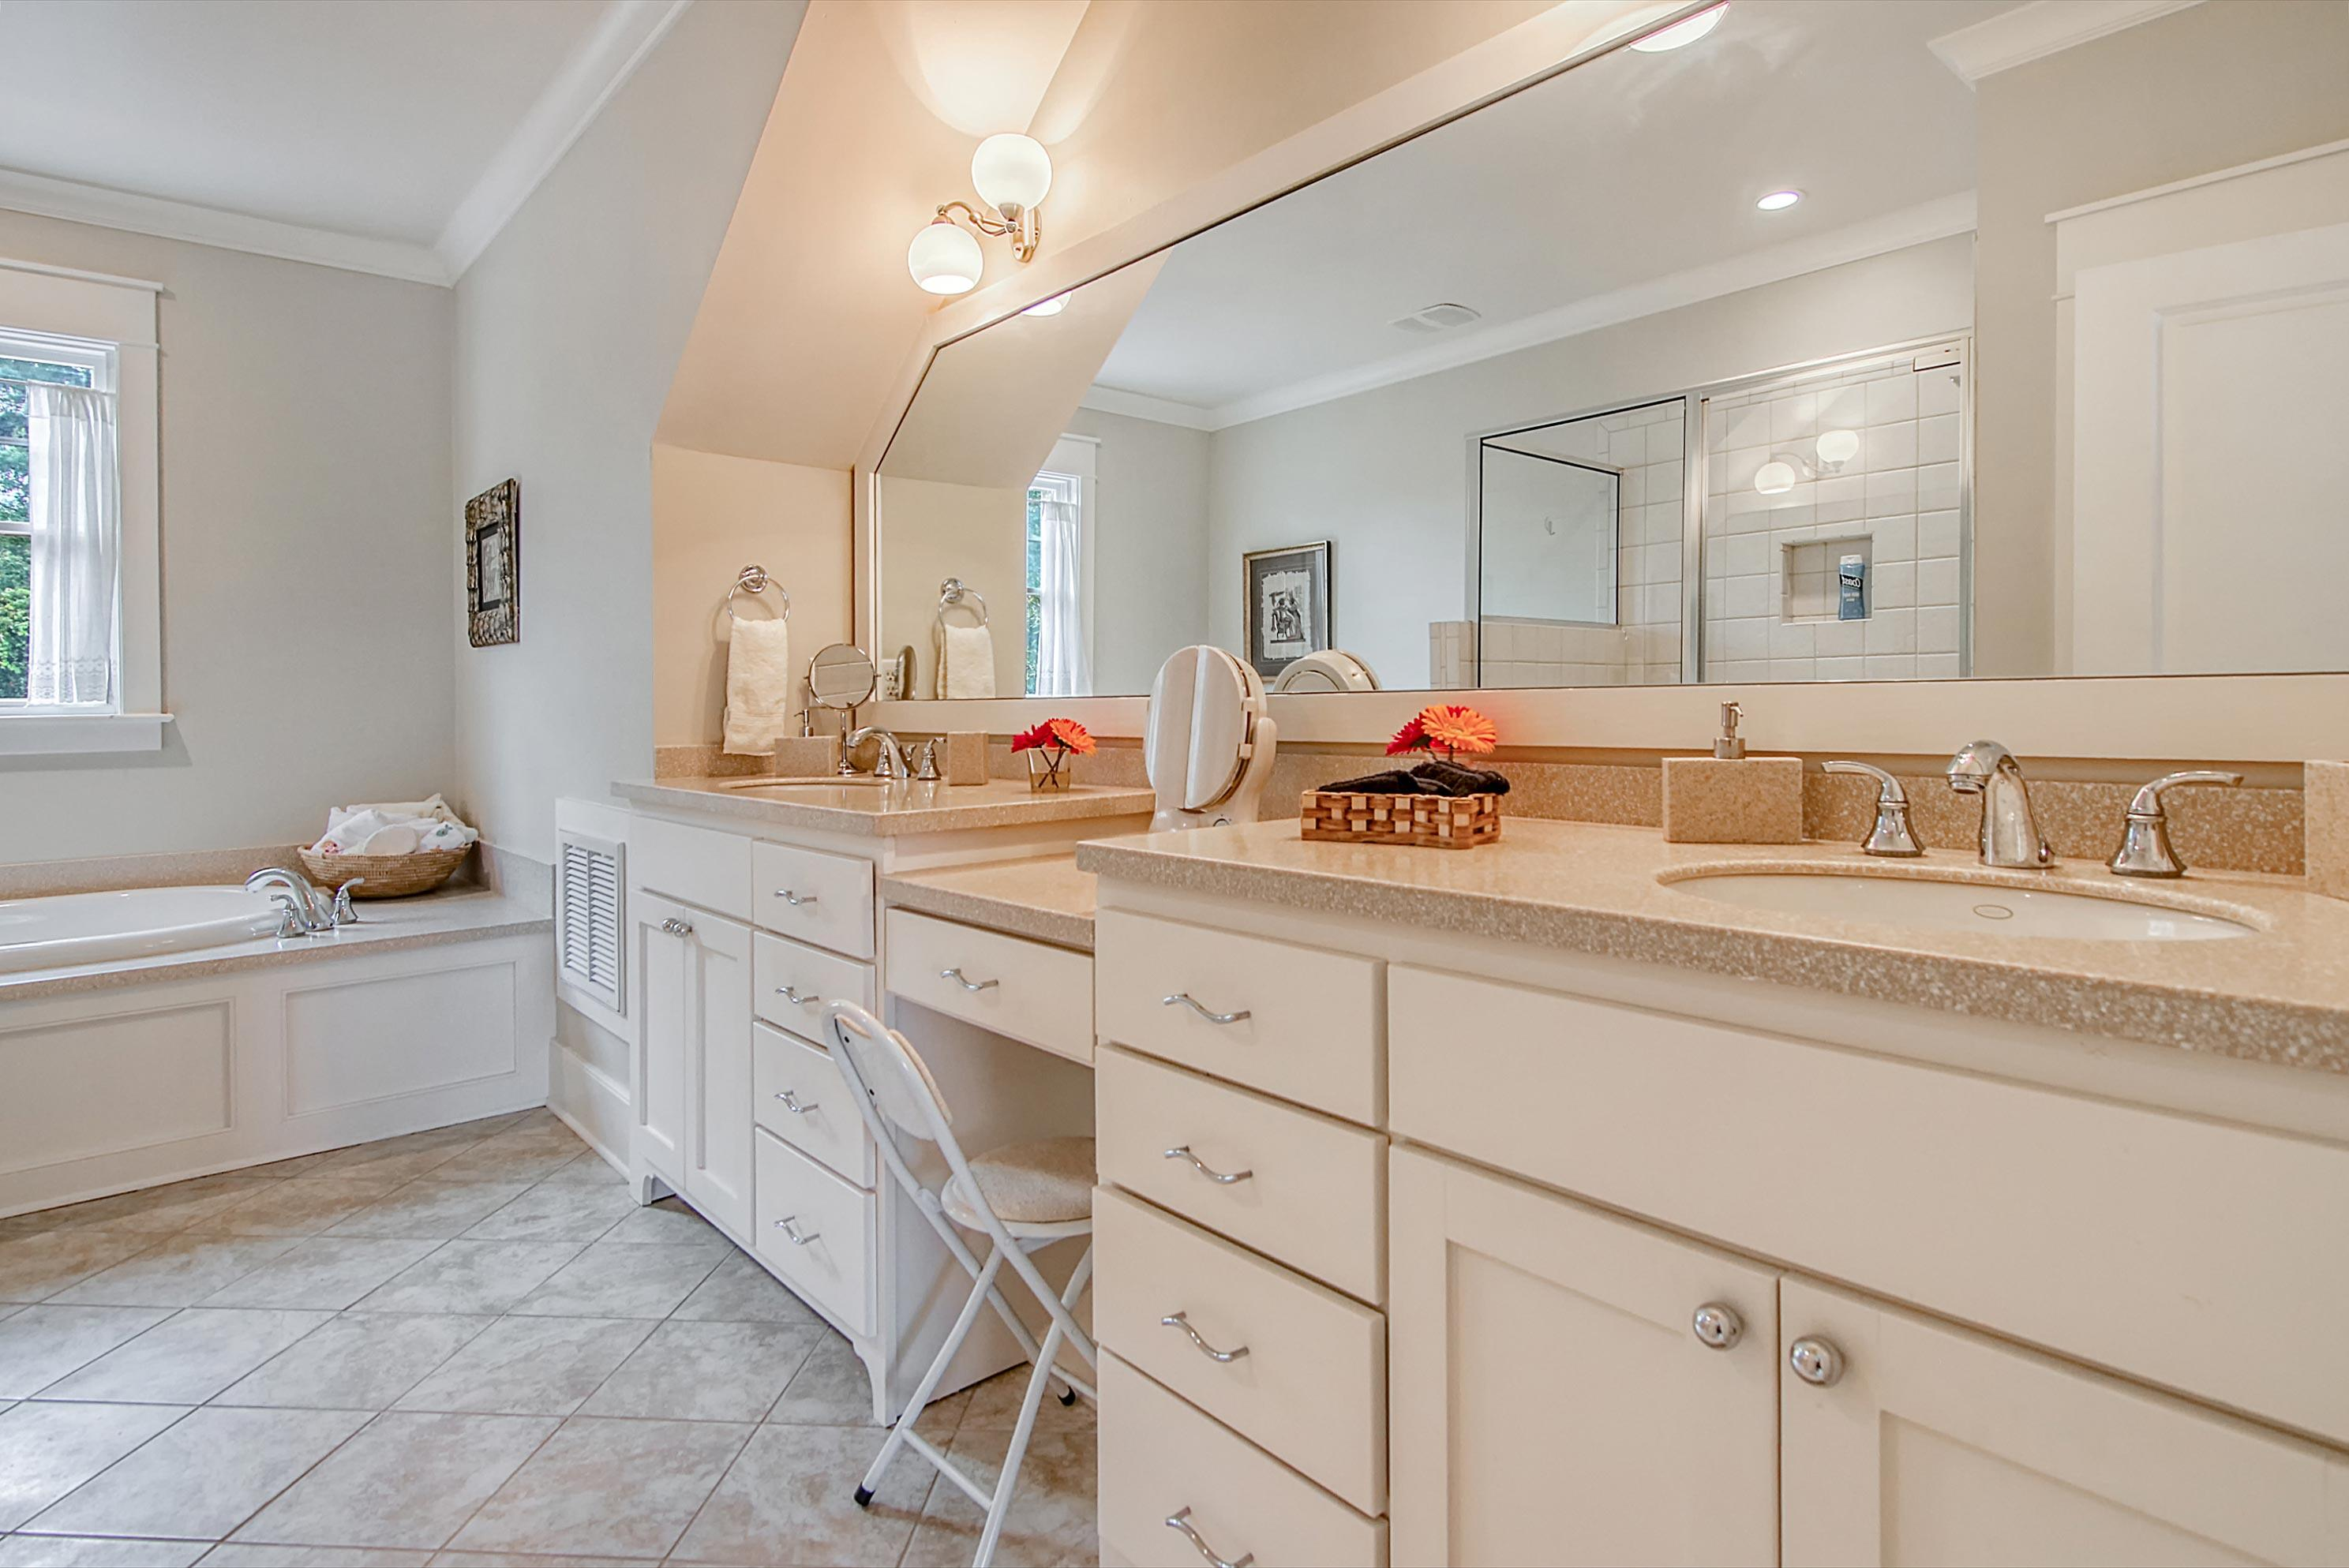 Scanlonville Homes For Sale - 152 6th, Mount Pleasant, SC - 26